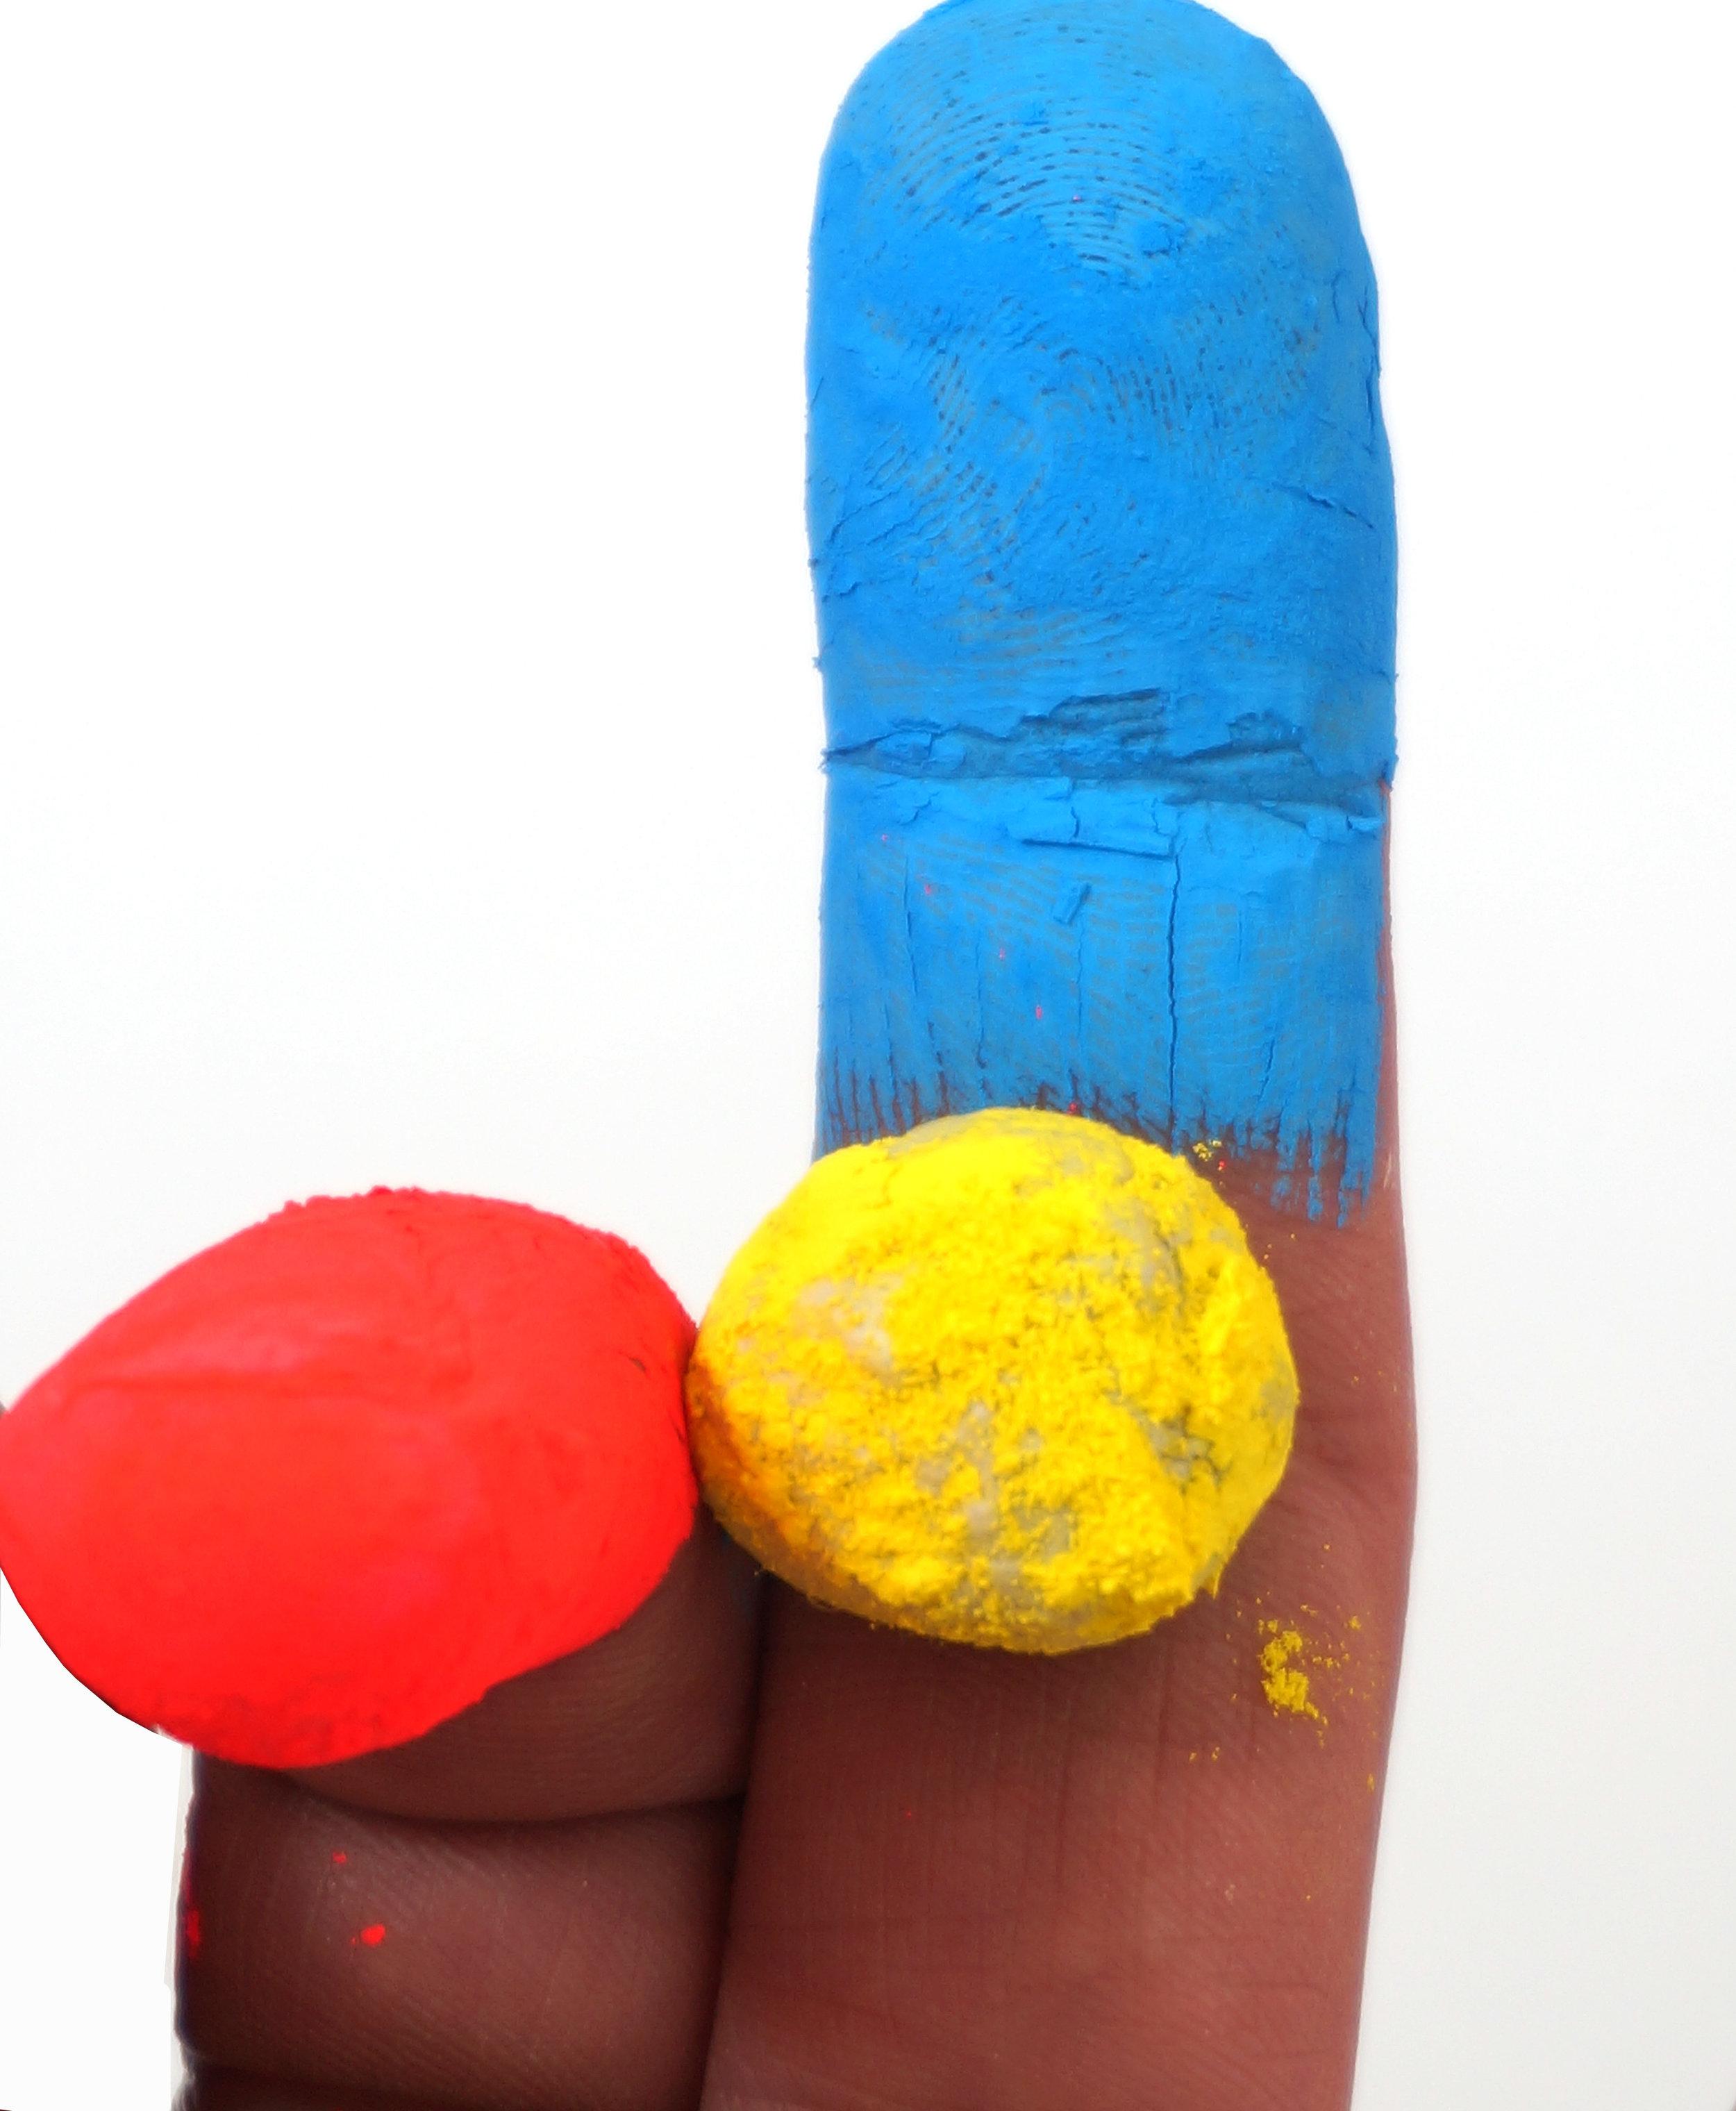 Finger sculpture 1, 2018  type c print on cotton rag  dimensions variable